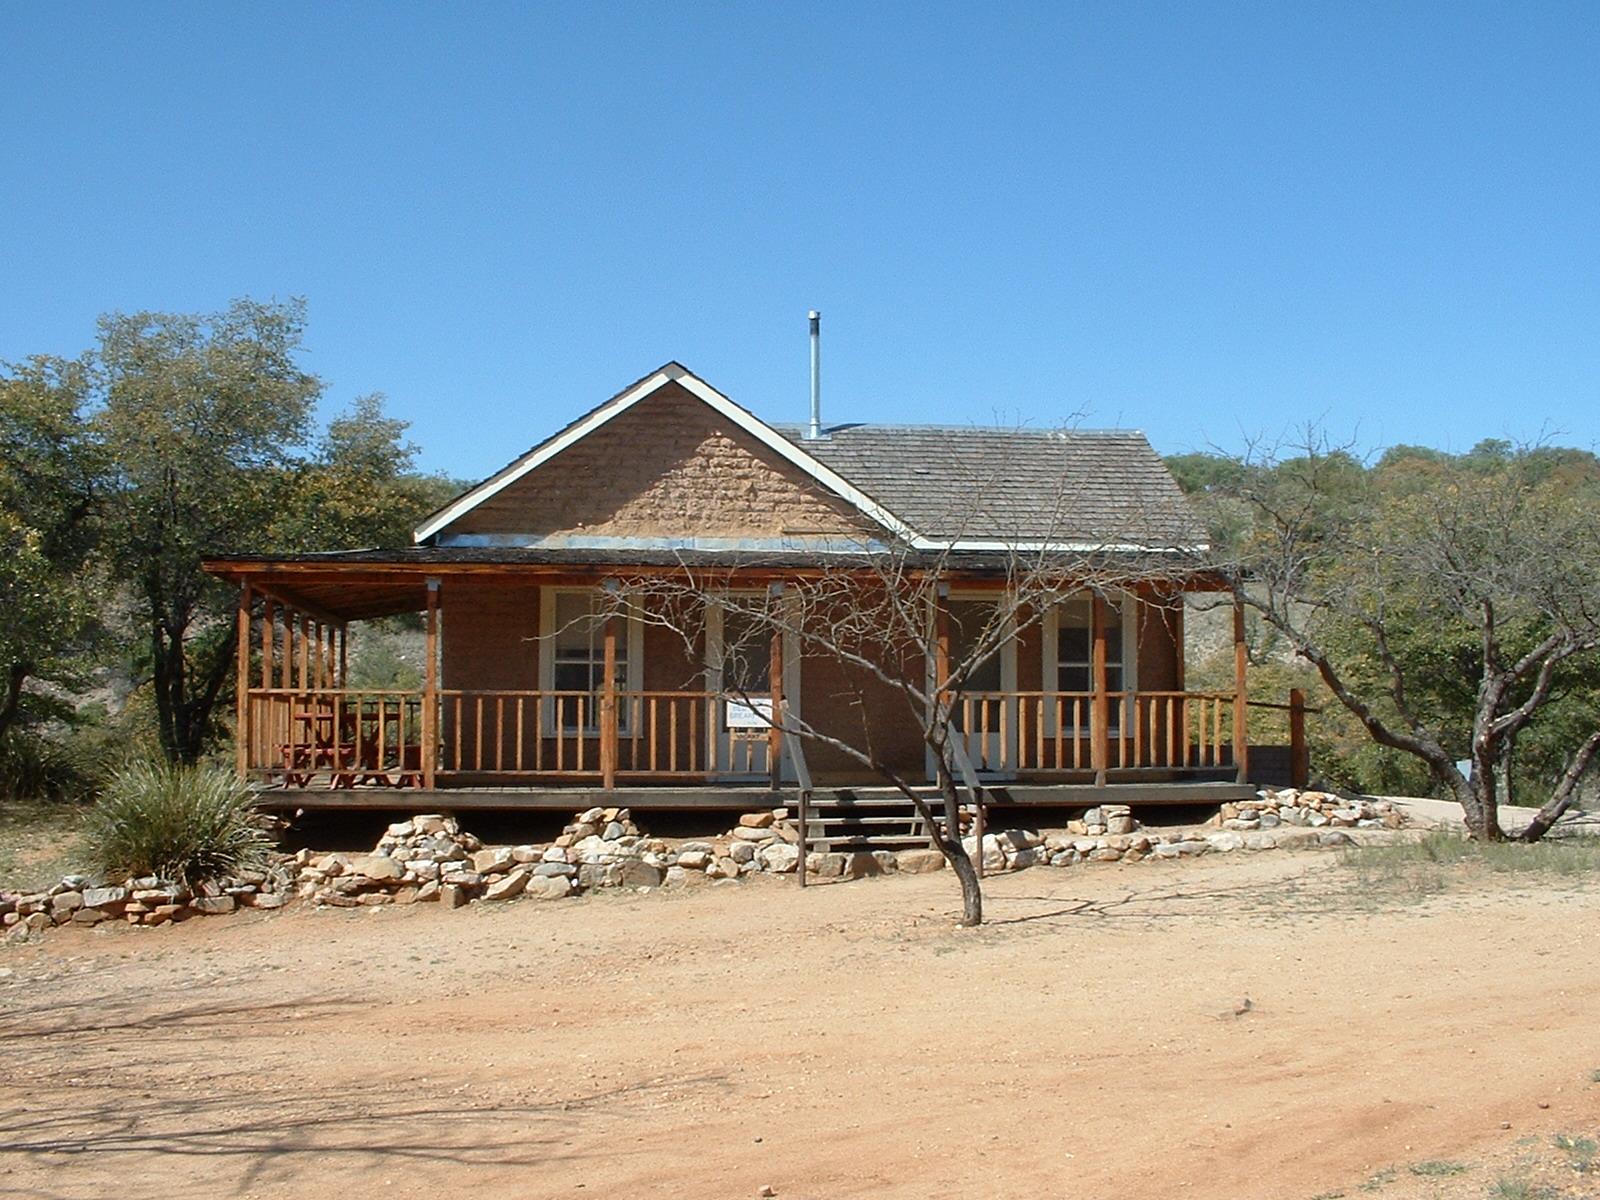 sleepy near album lodge in arizona bear cabins payson az rentals overgaard cabin rental